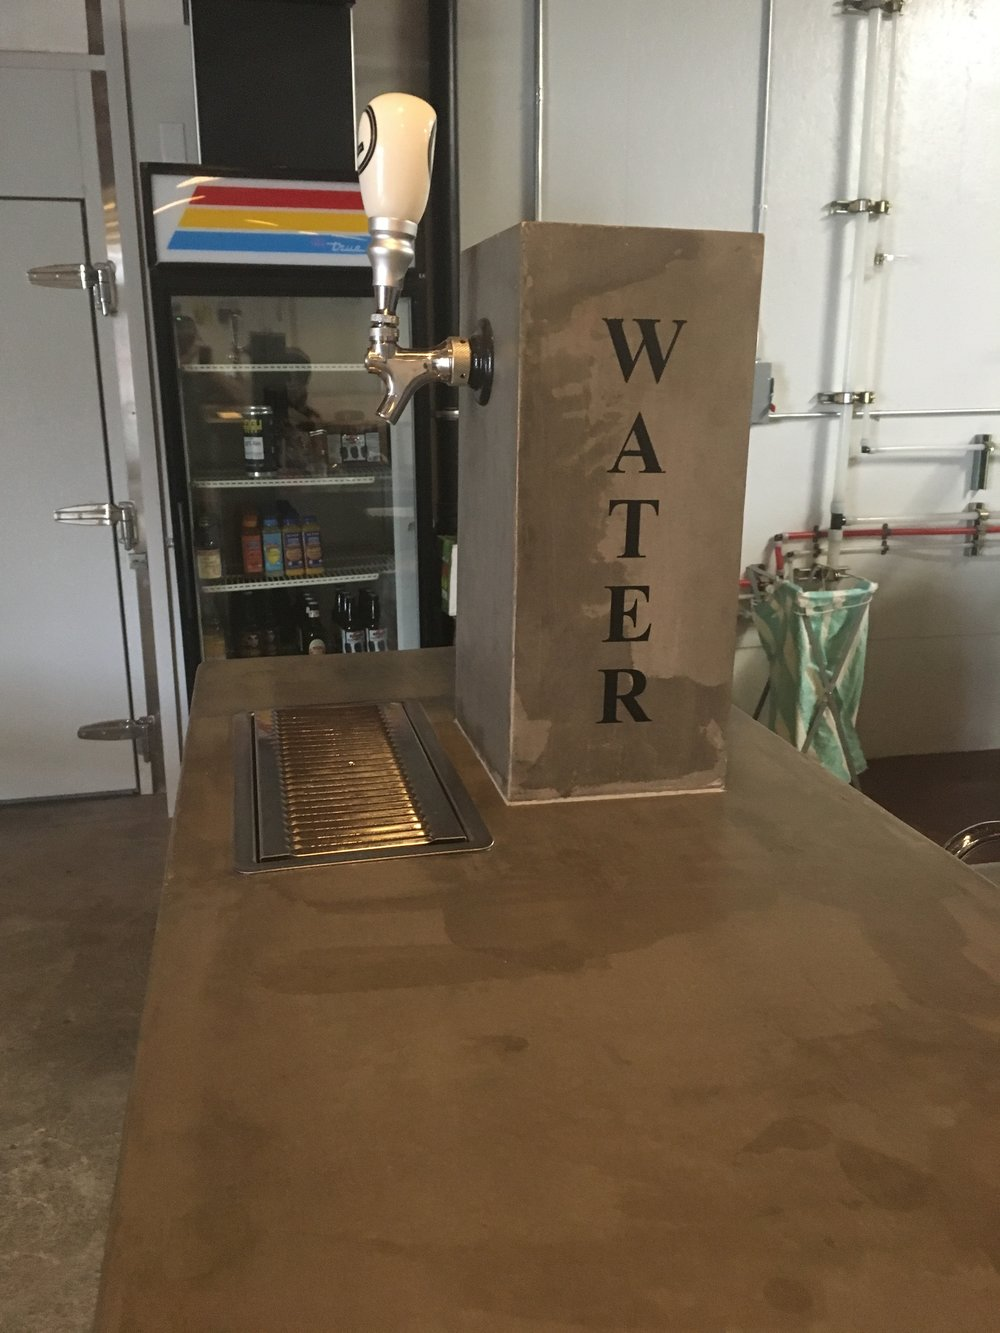 Water draft tower